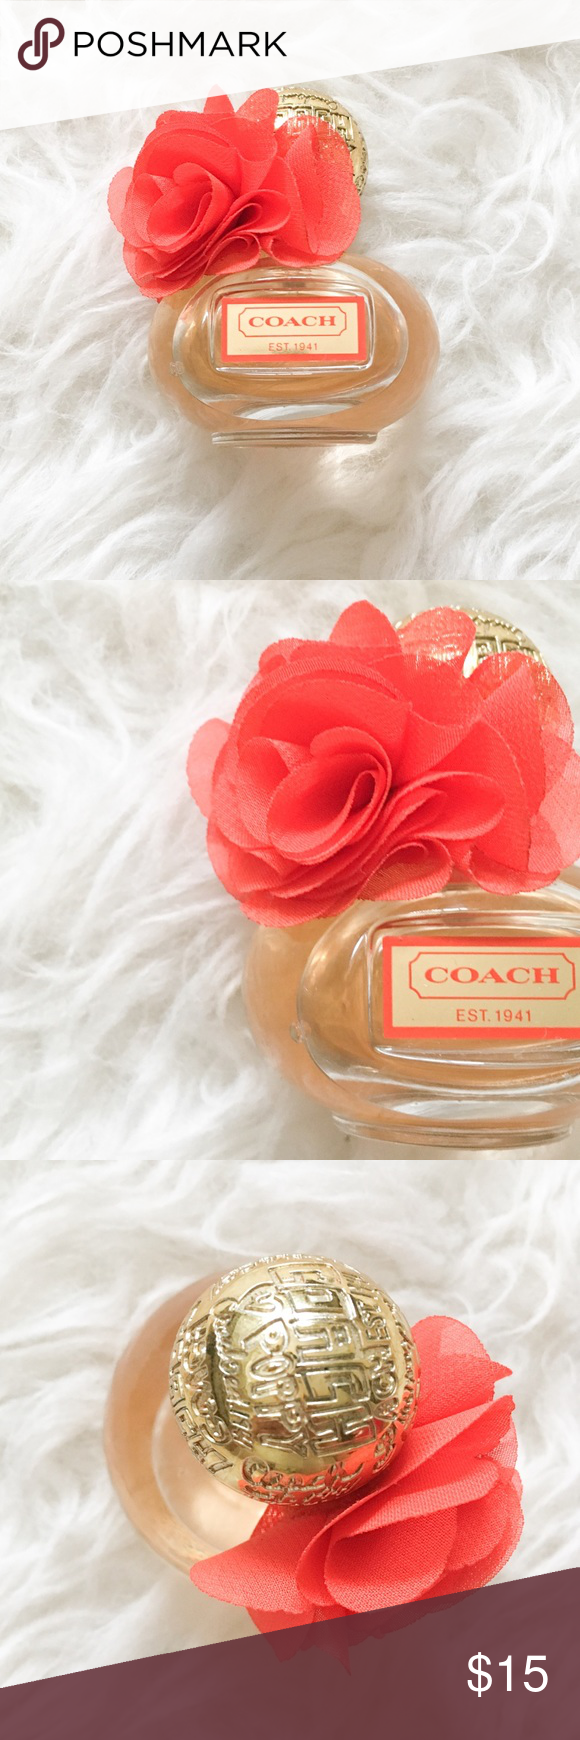 Coach Perfume Coach Perfume Coach Poppy And Perfume